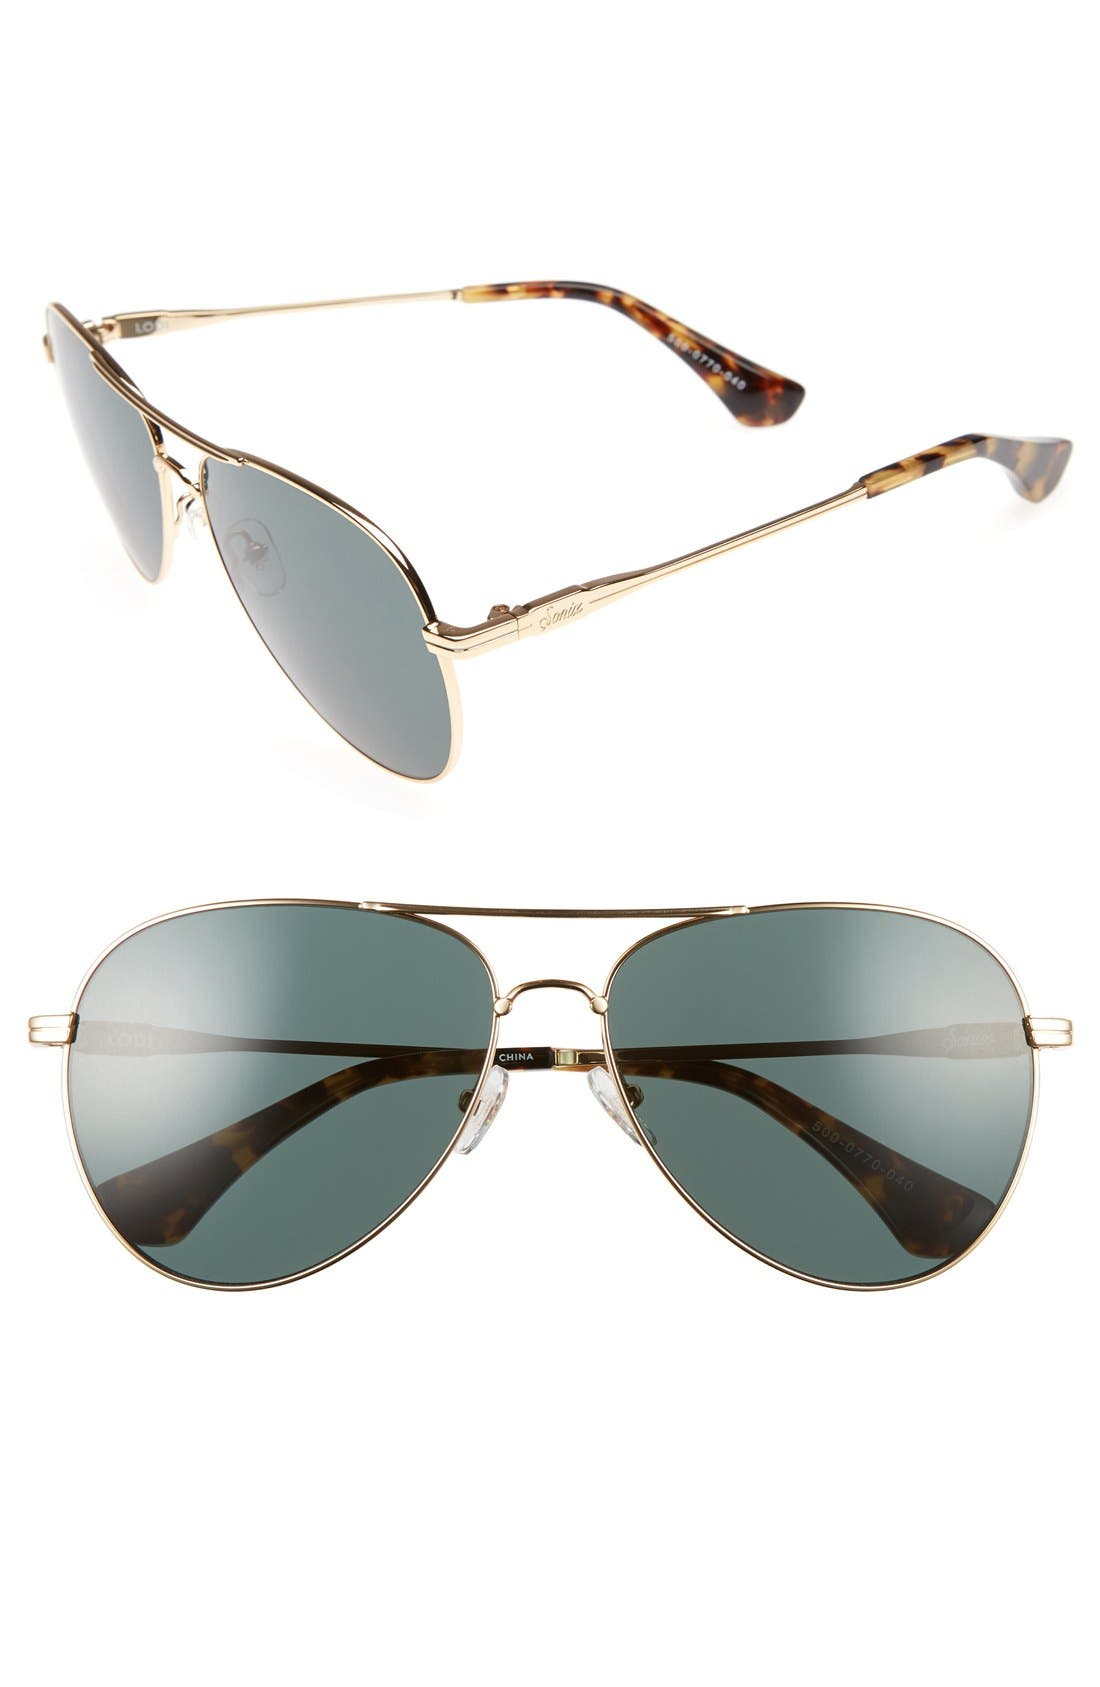 Lodi 62mm Mirrored Aviator Sunglasses,                             Main thumbnail 1, color,